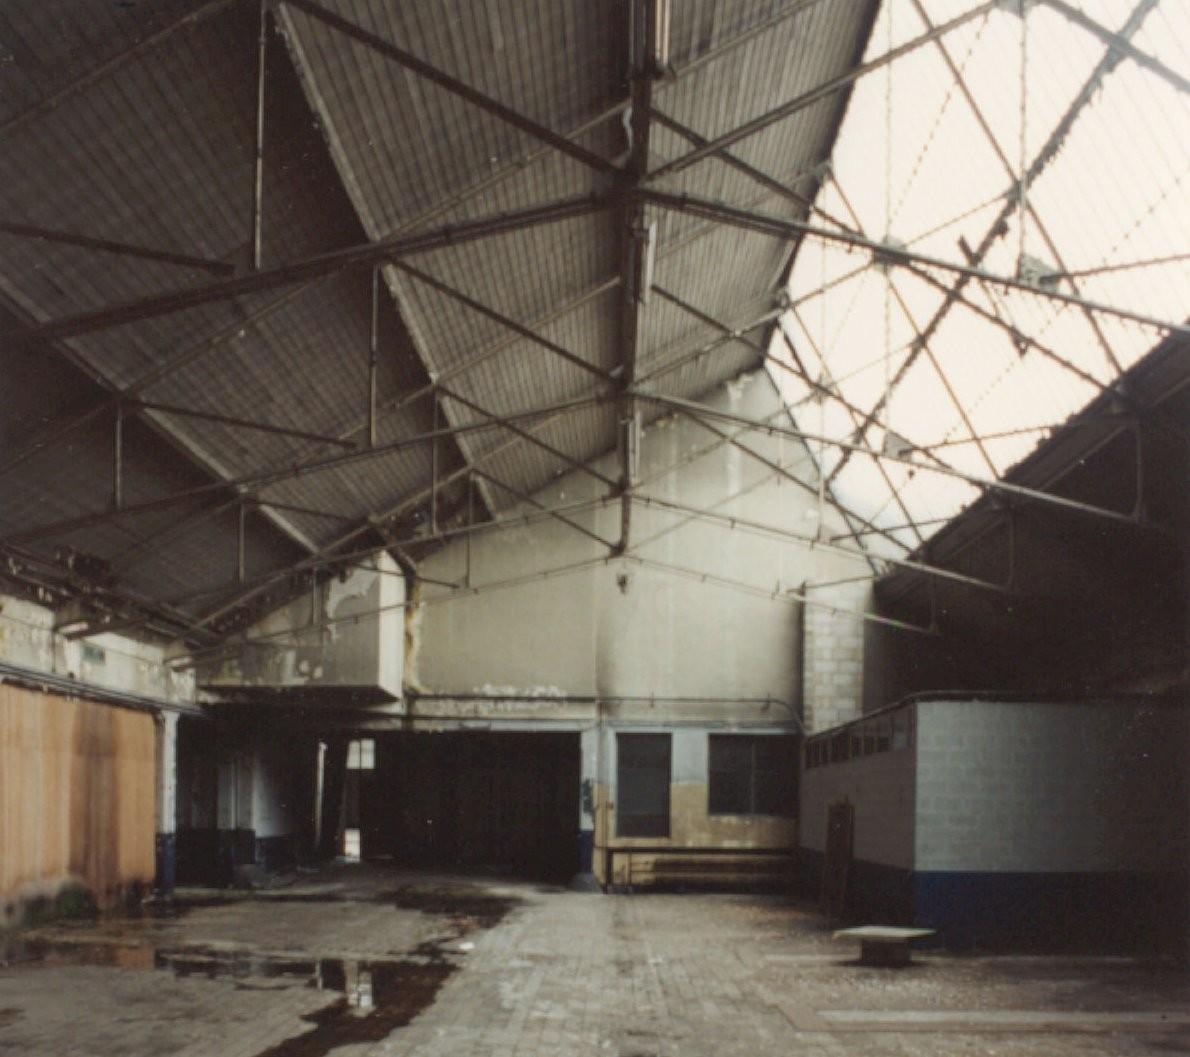 Sheddak voormalige paardenstallen en koetshuis van de for Modernisme architecture definition